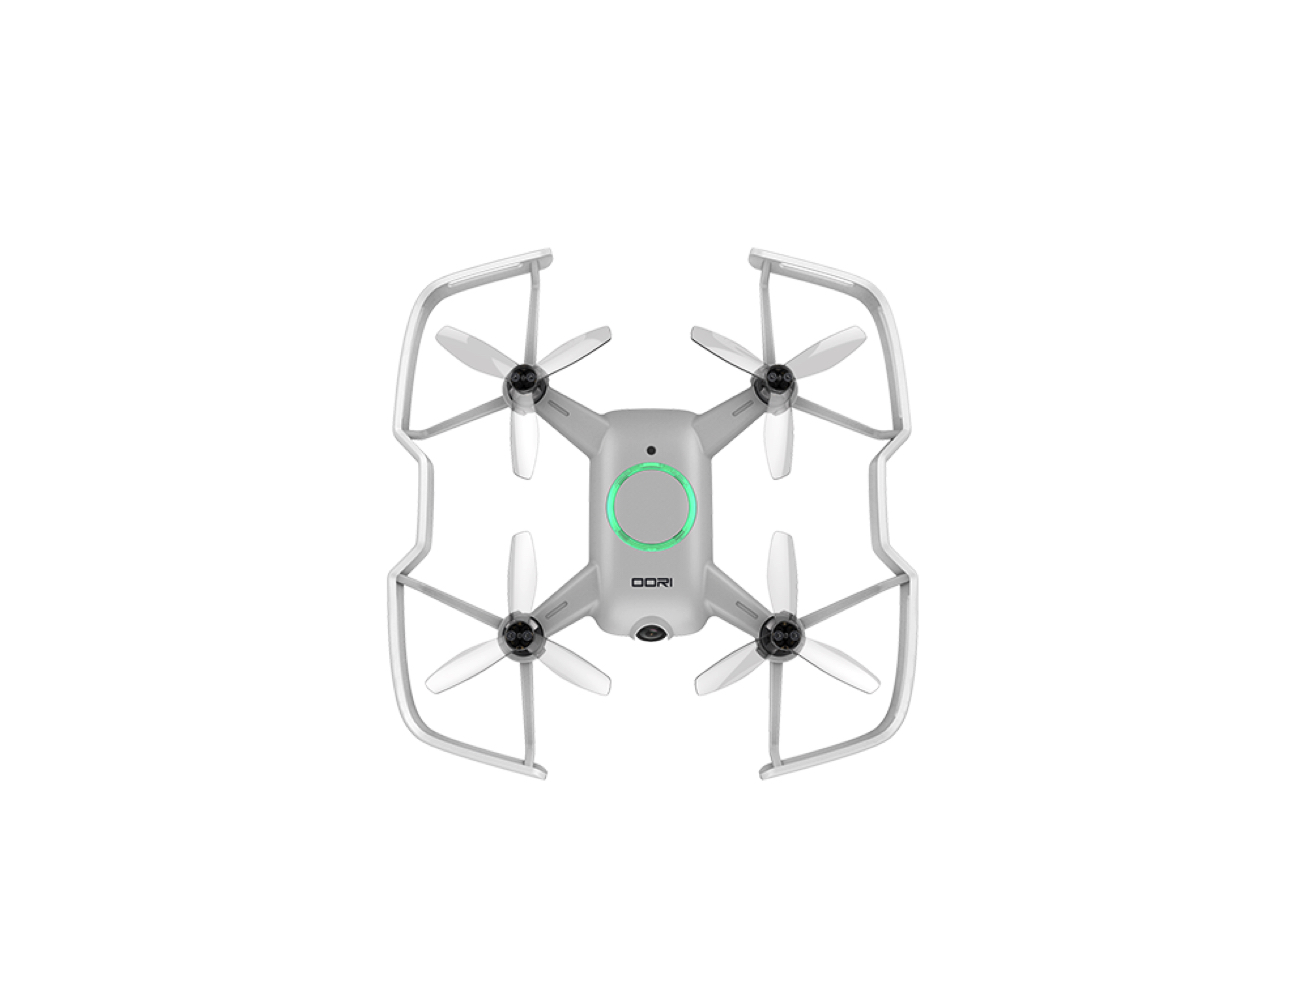 UVify OOri Smart Micro Racing Drone